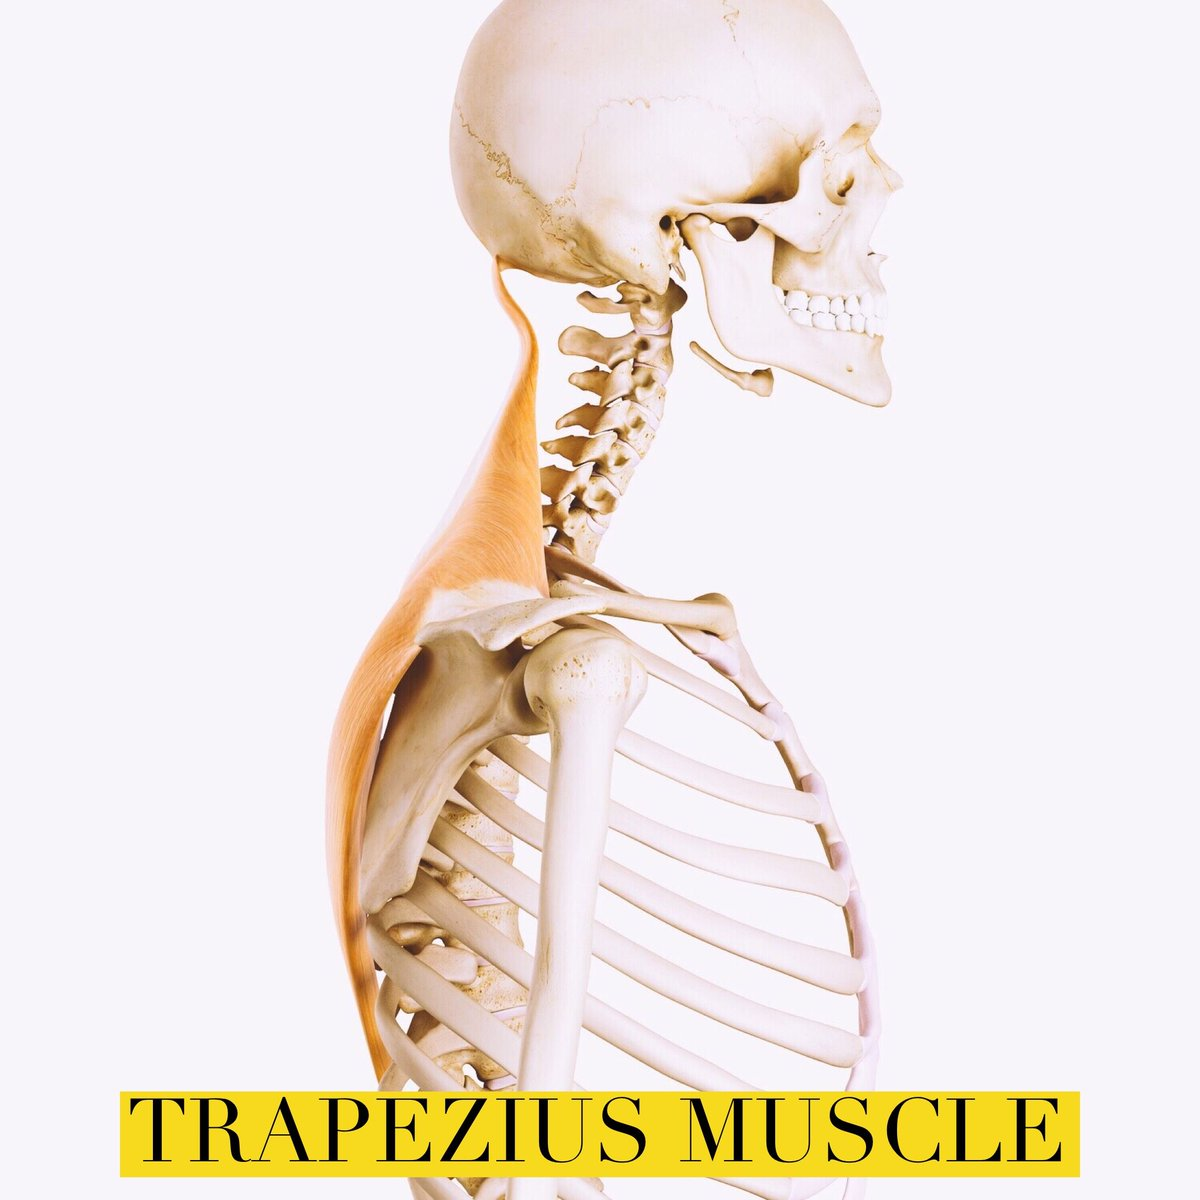 Trapeziusmuscle Hashtag On Twitter